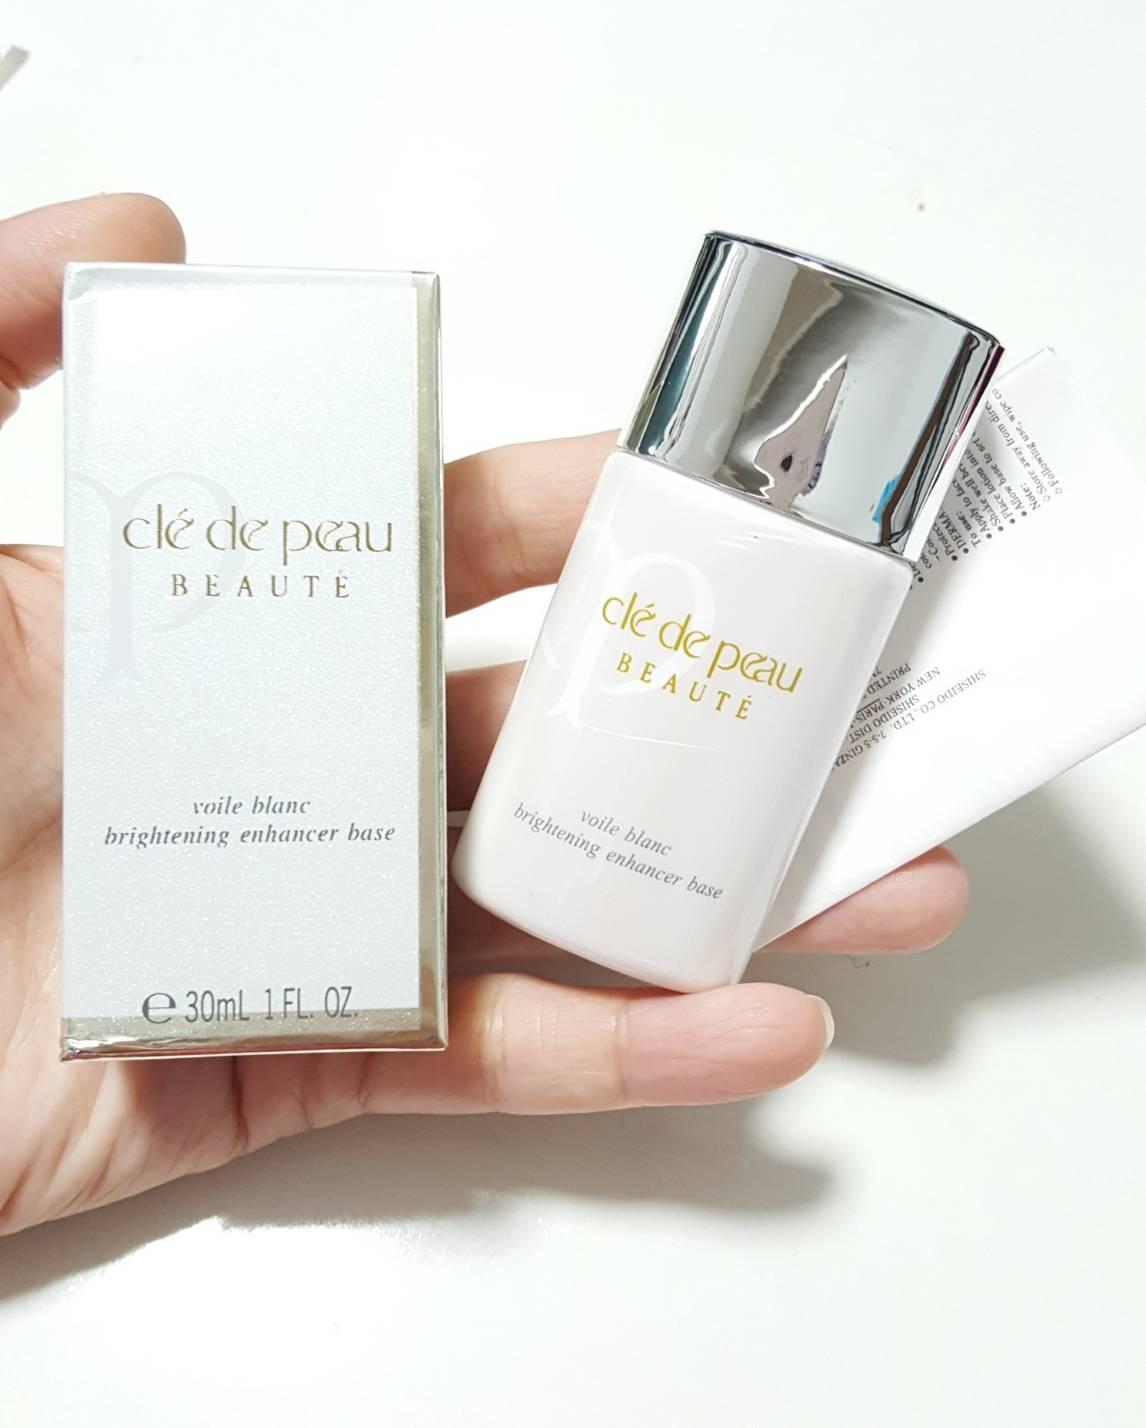 Cle De Peau Beaute voile blanc brightening enhancer base 30ml.เบสปรับผิว ถ่ายจากสินค้าจริง